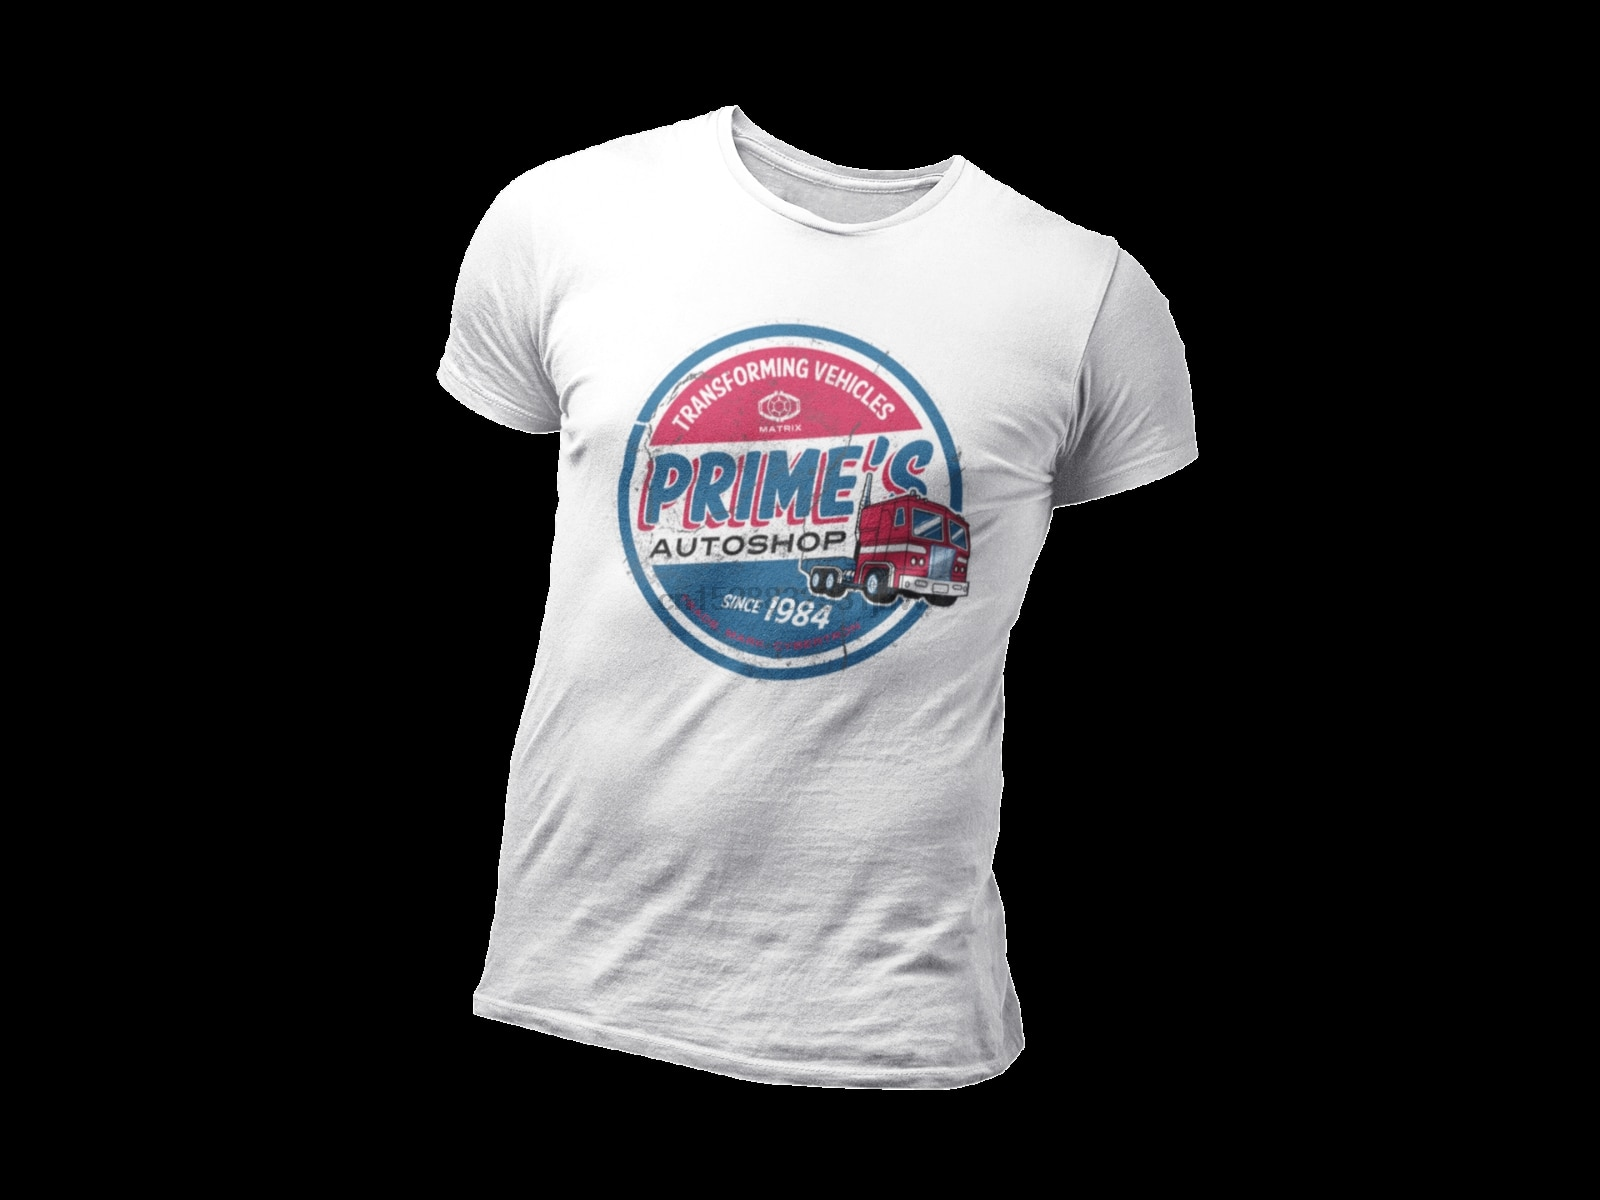 Optimus Prime Film Movie Retro Autobot Bumble Bee T Shirt Truck Trucker New Fashion T shirt Brand Hip Hop Print Men Tee Shirt Hi